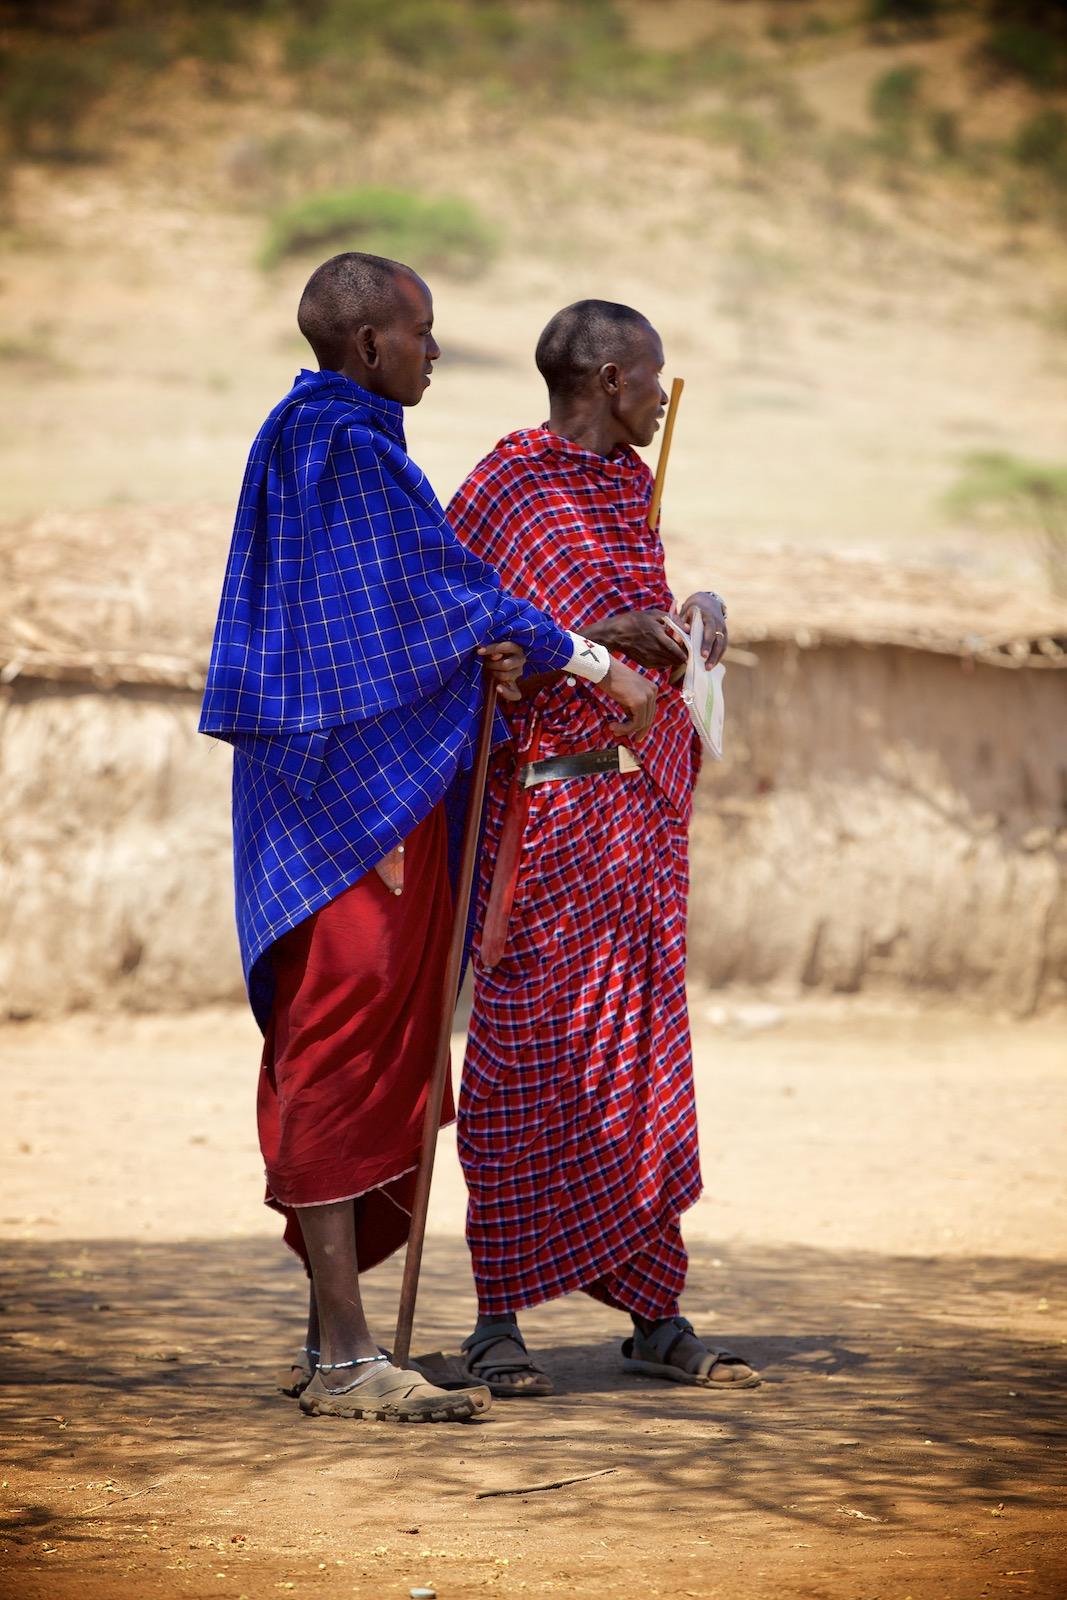 Masai nomadefolk